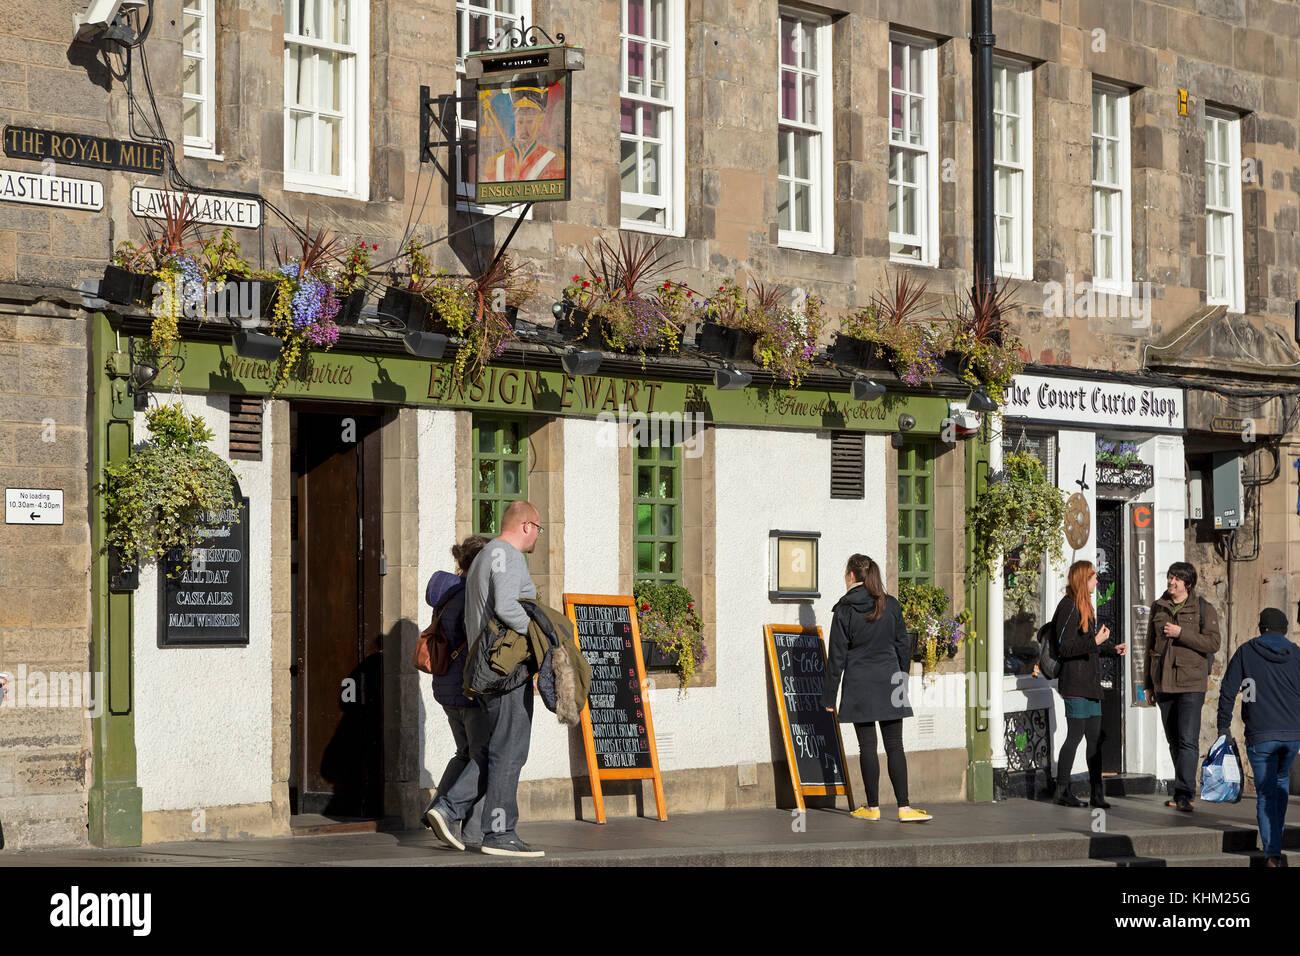 Pub, The Royal Mile, Edinburgh, Scotland, Great Britain - Stock Image